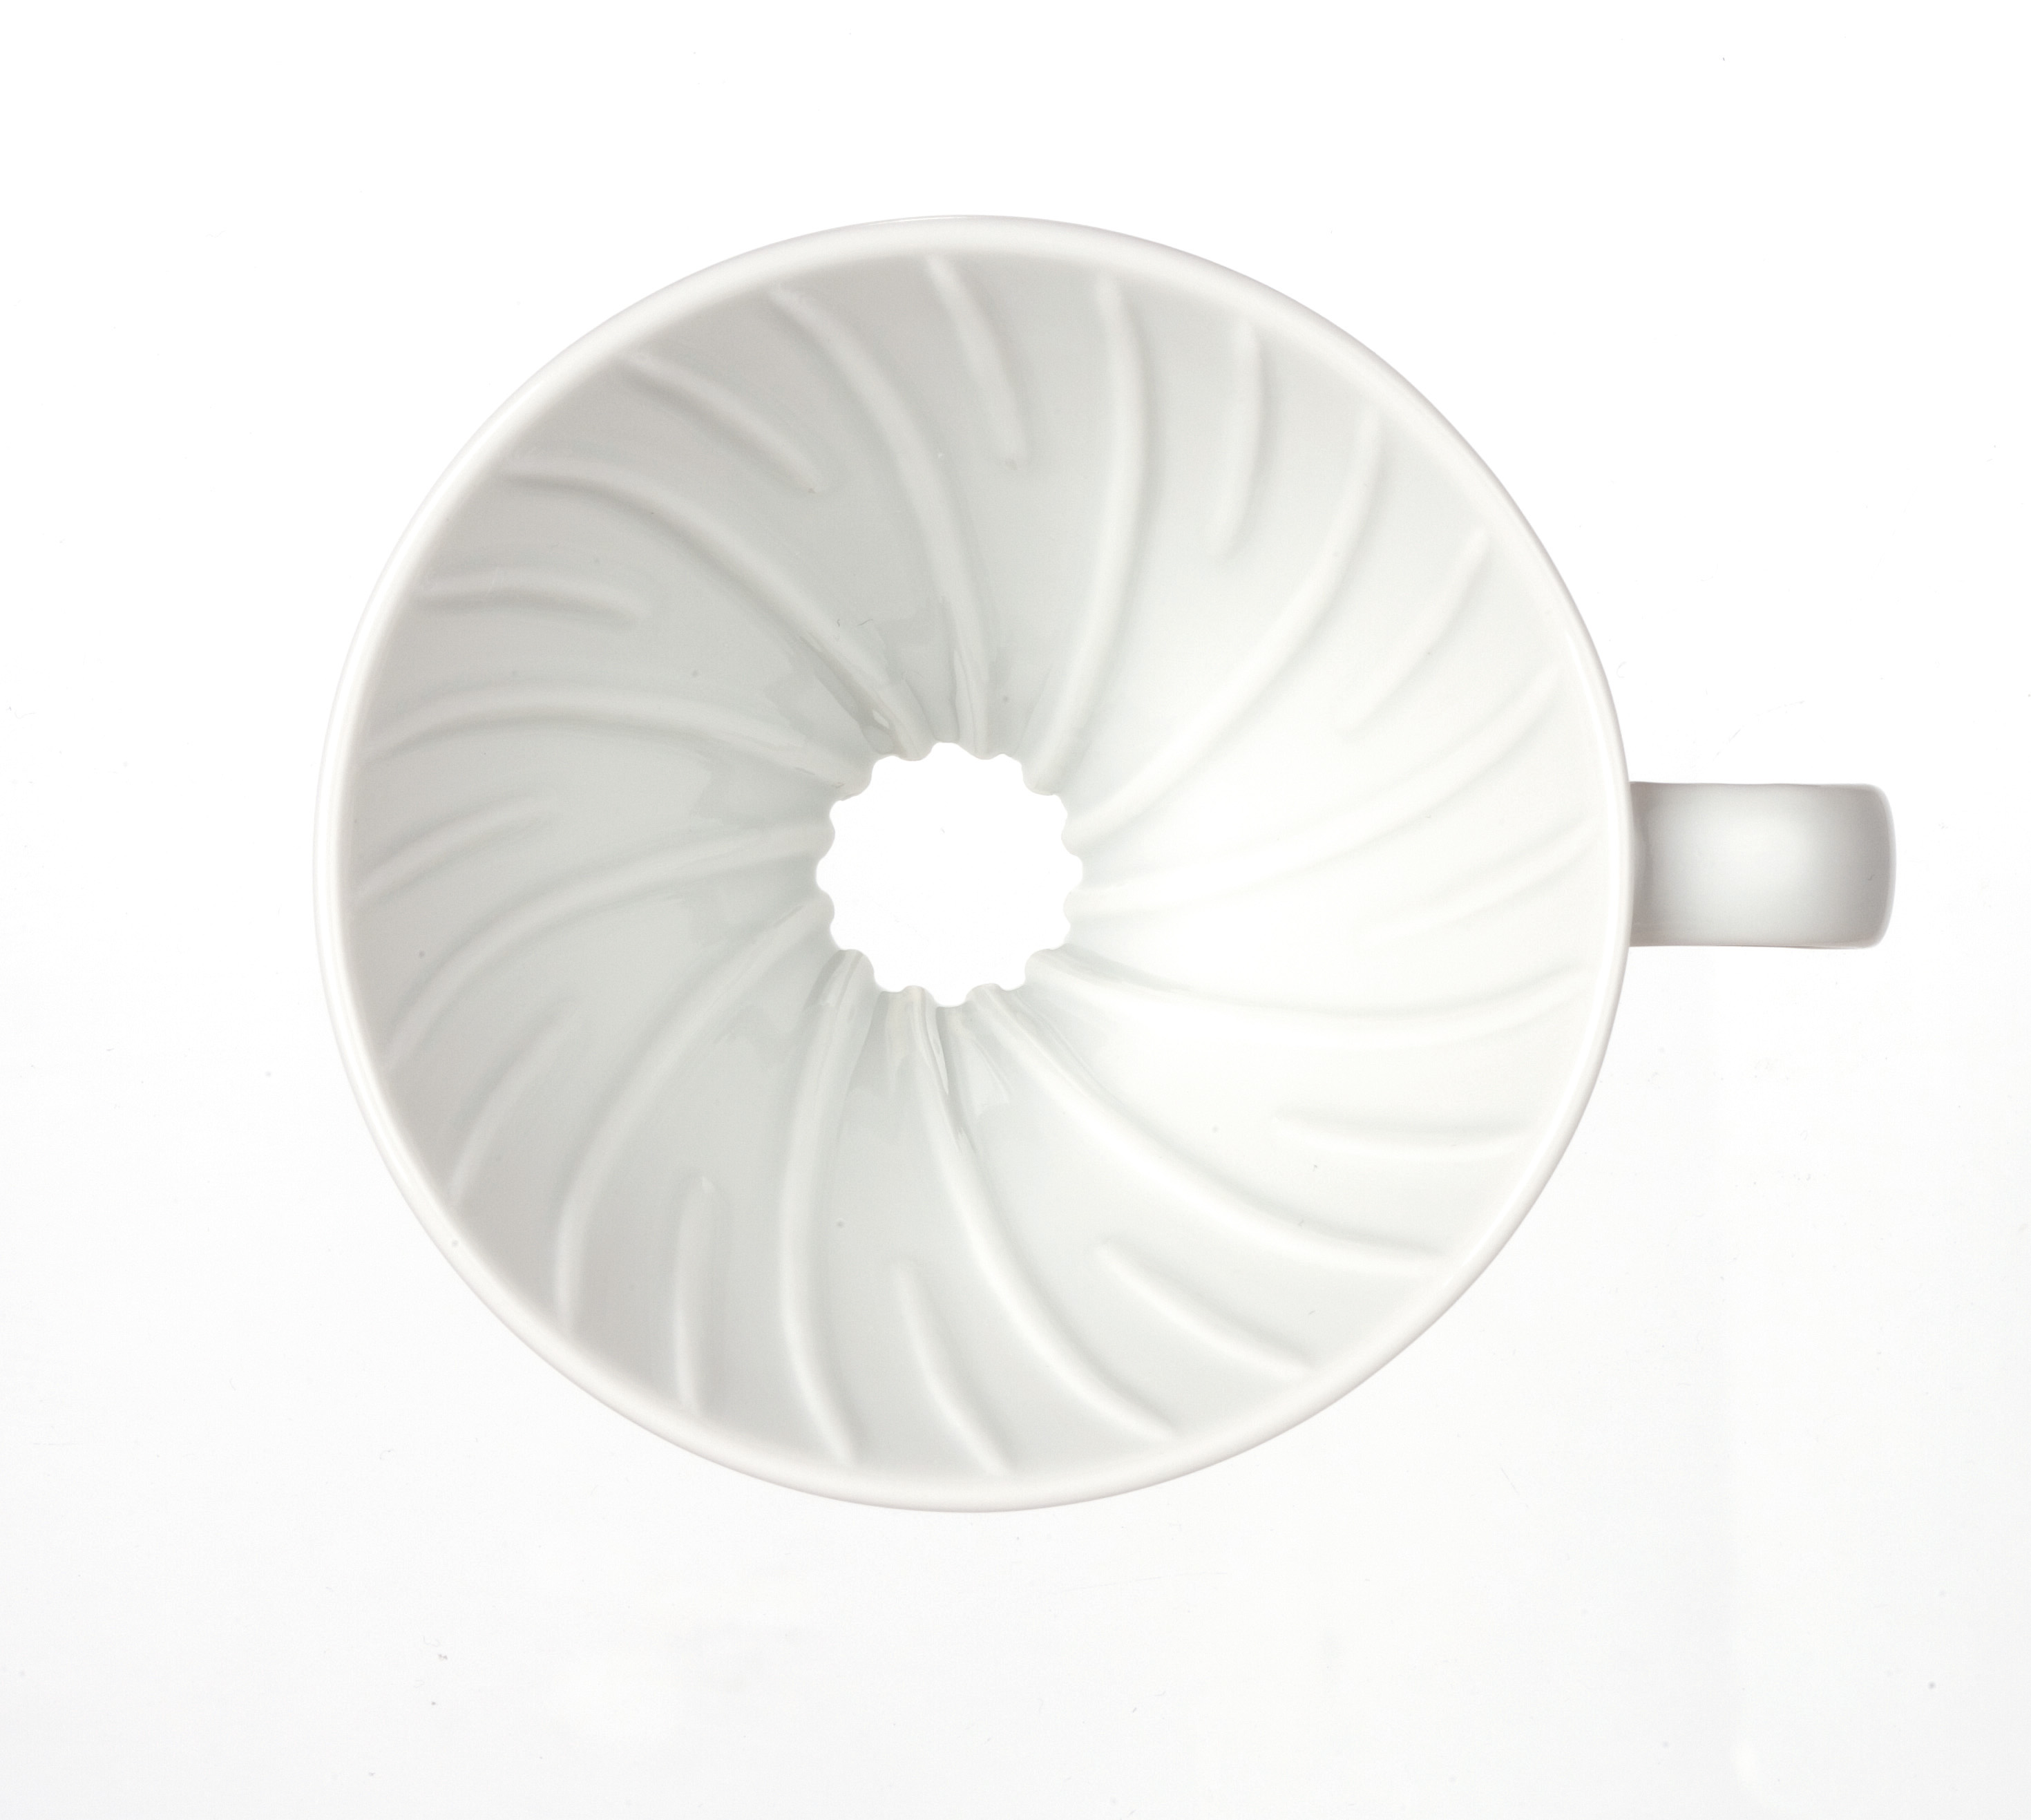 Hario V60 01 Beyaz Seramik Dripper